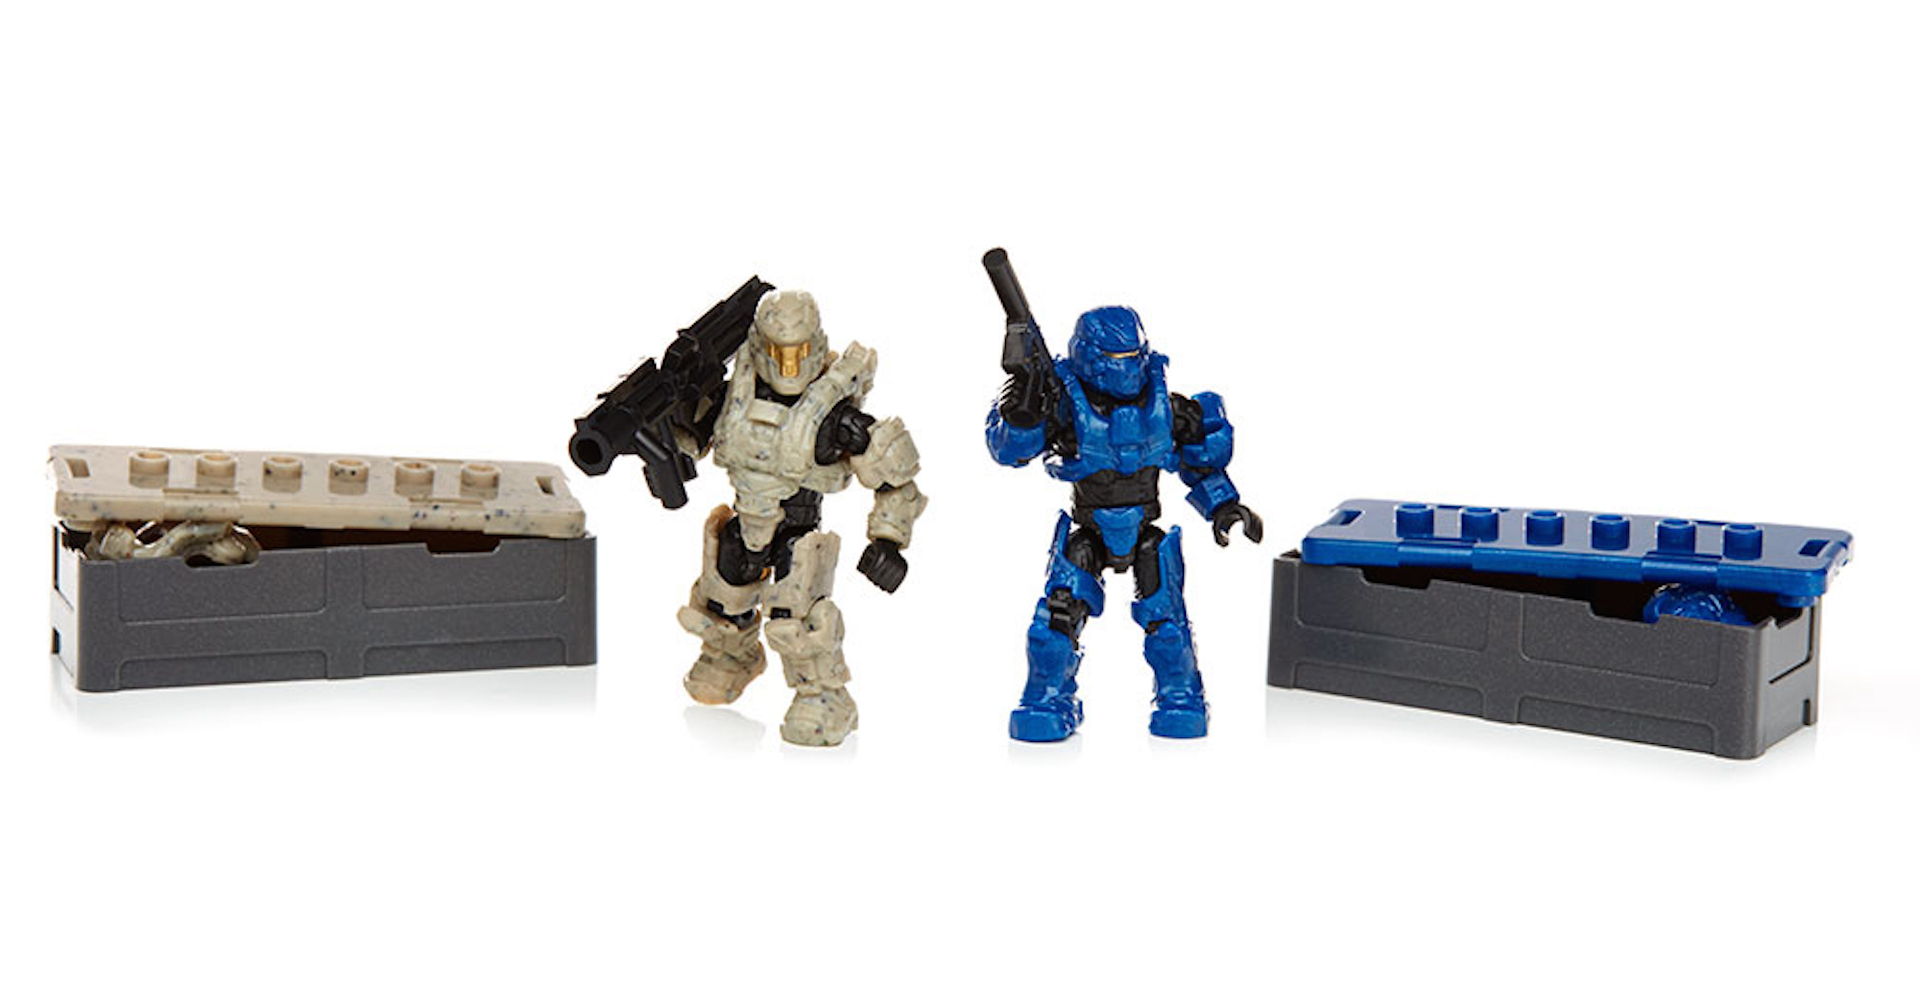 Halo Mega Bloks Spartan Armor Customizer Pack | Brutal Gamer